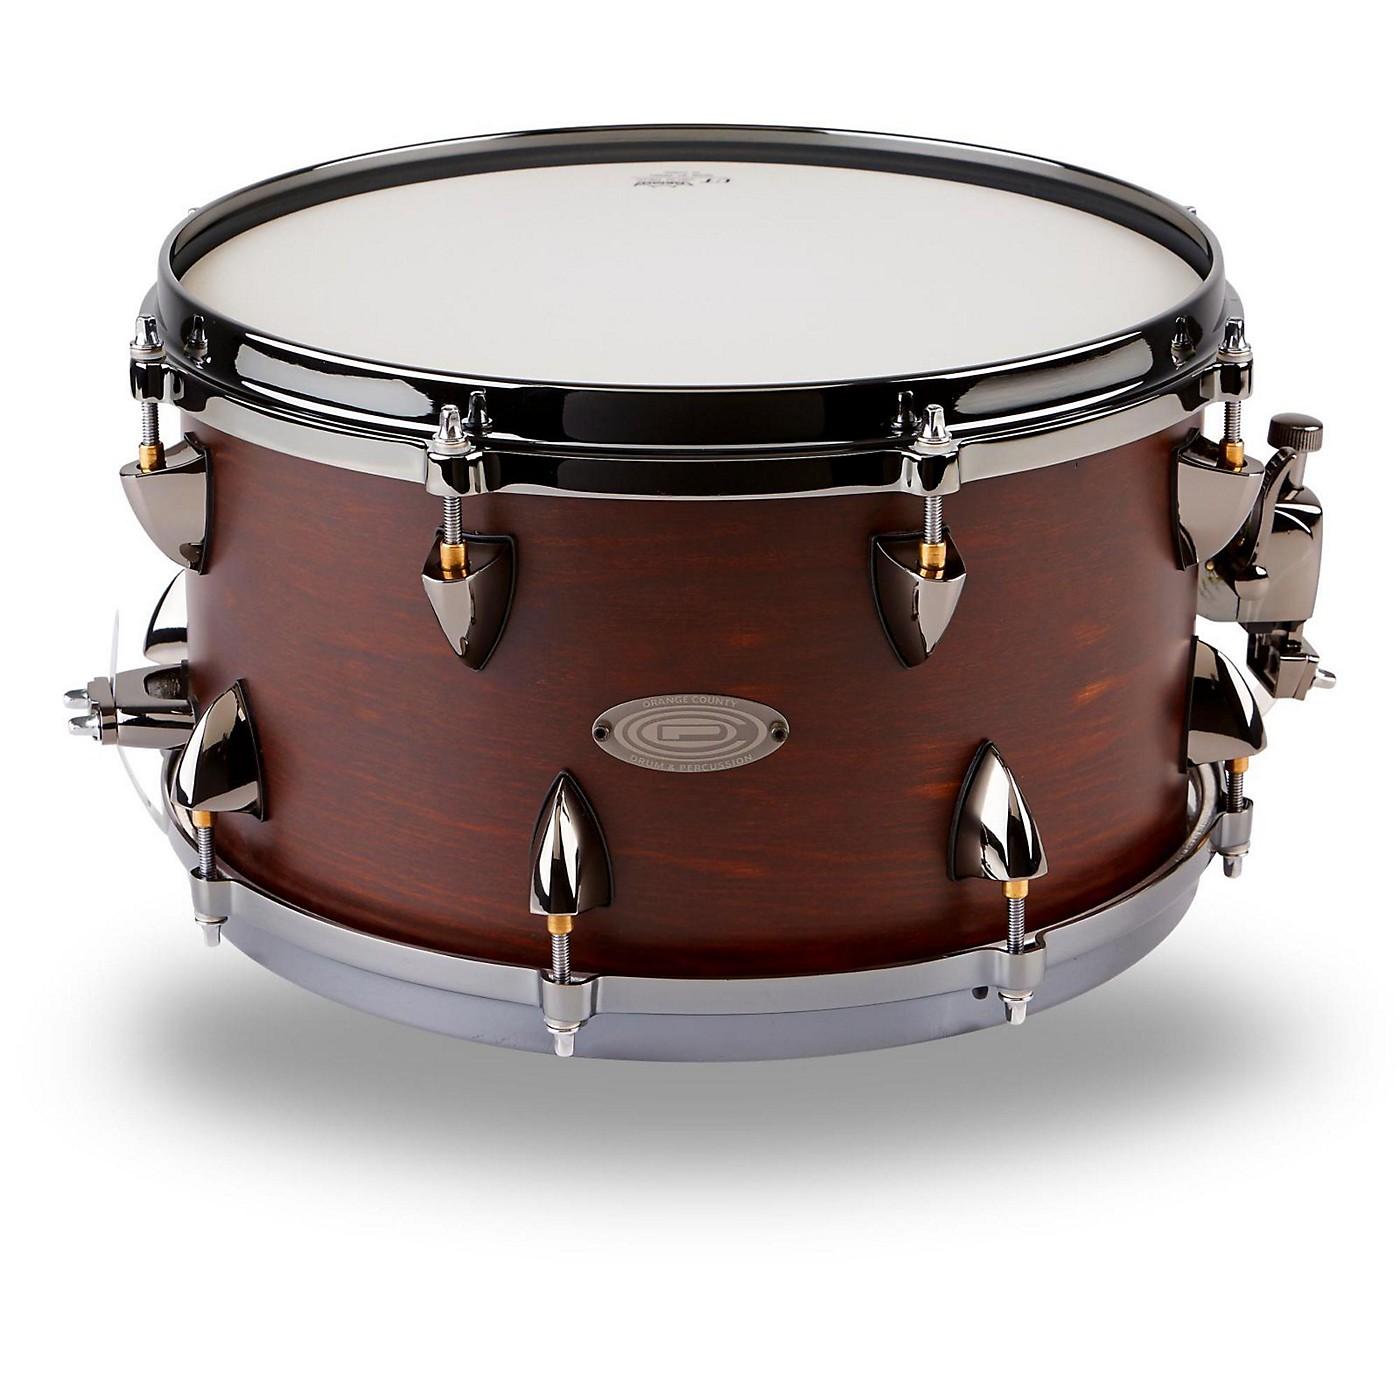 Orange County Drum & Percussion Snare Drum thumbnail